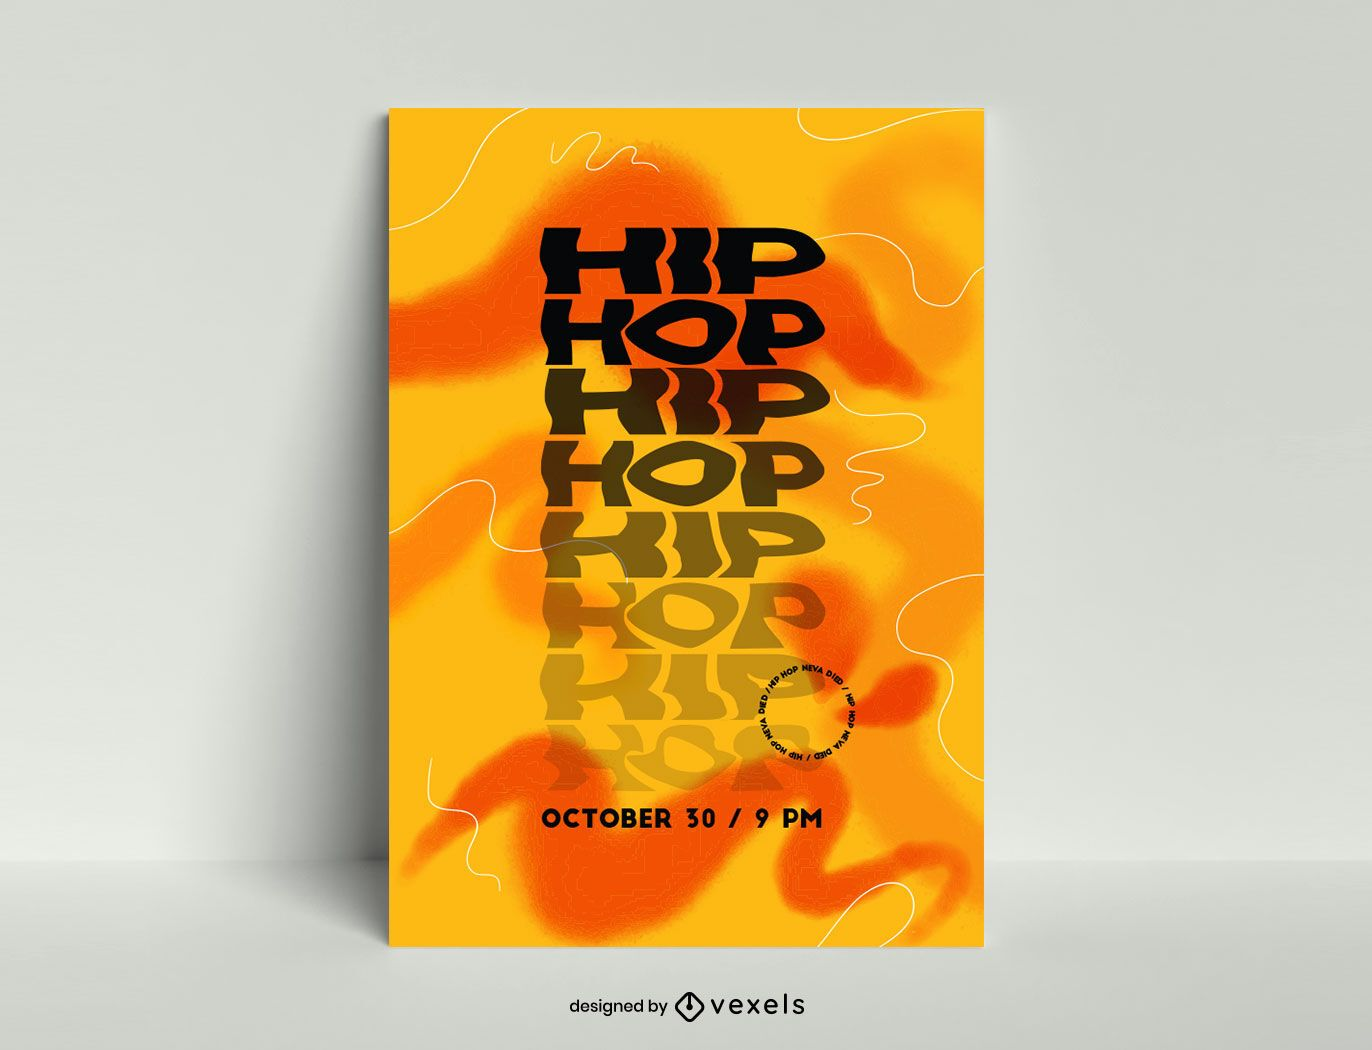 Hip hop poster template